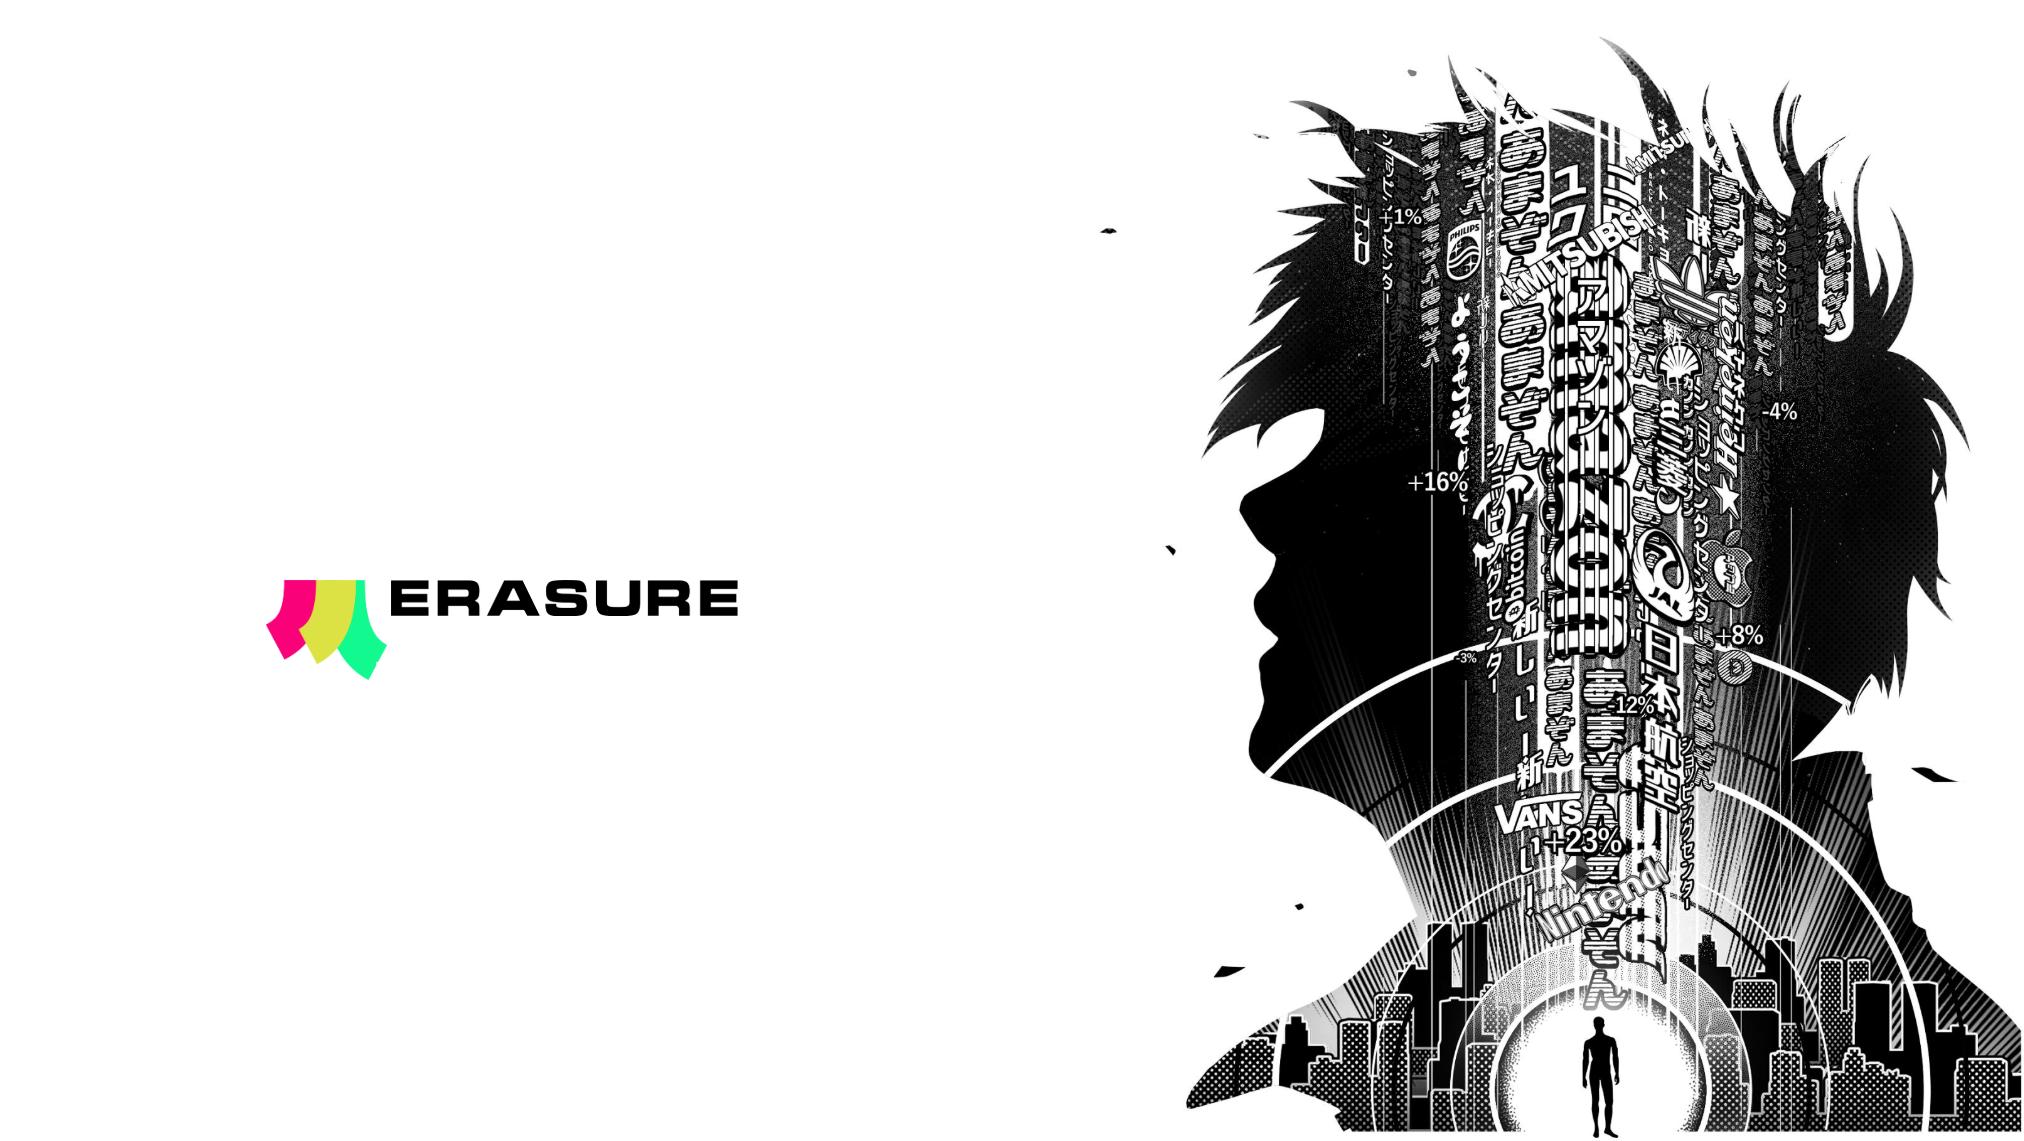 Numerai is launching the Erasure protocol